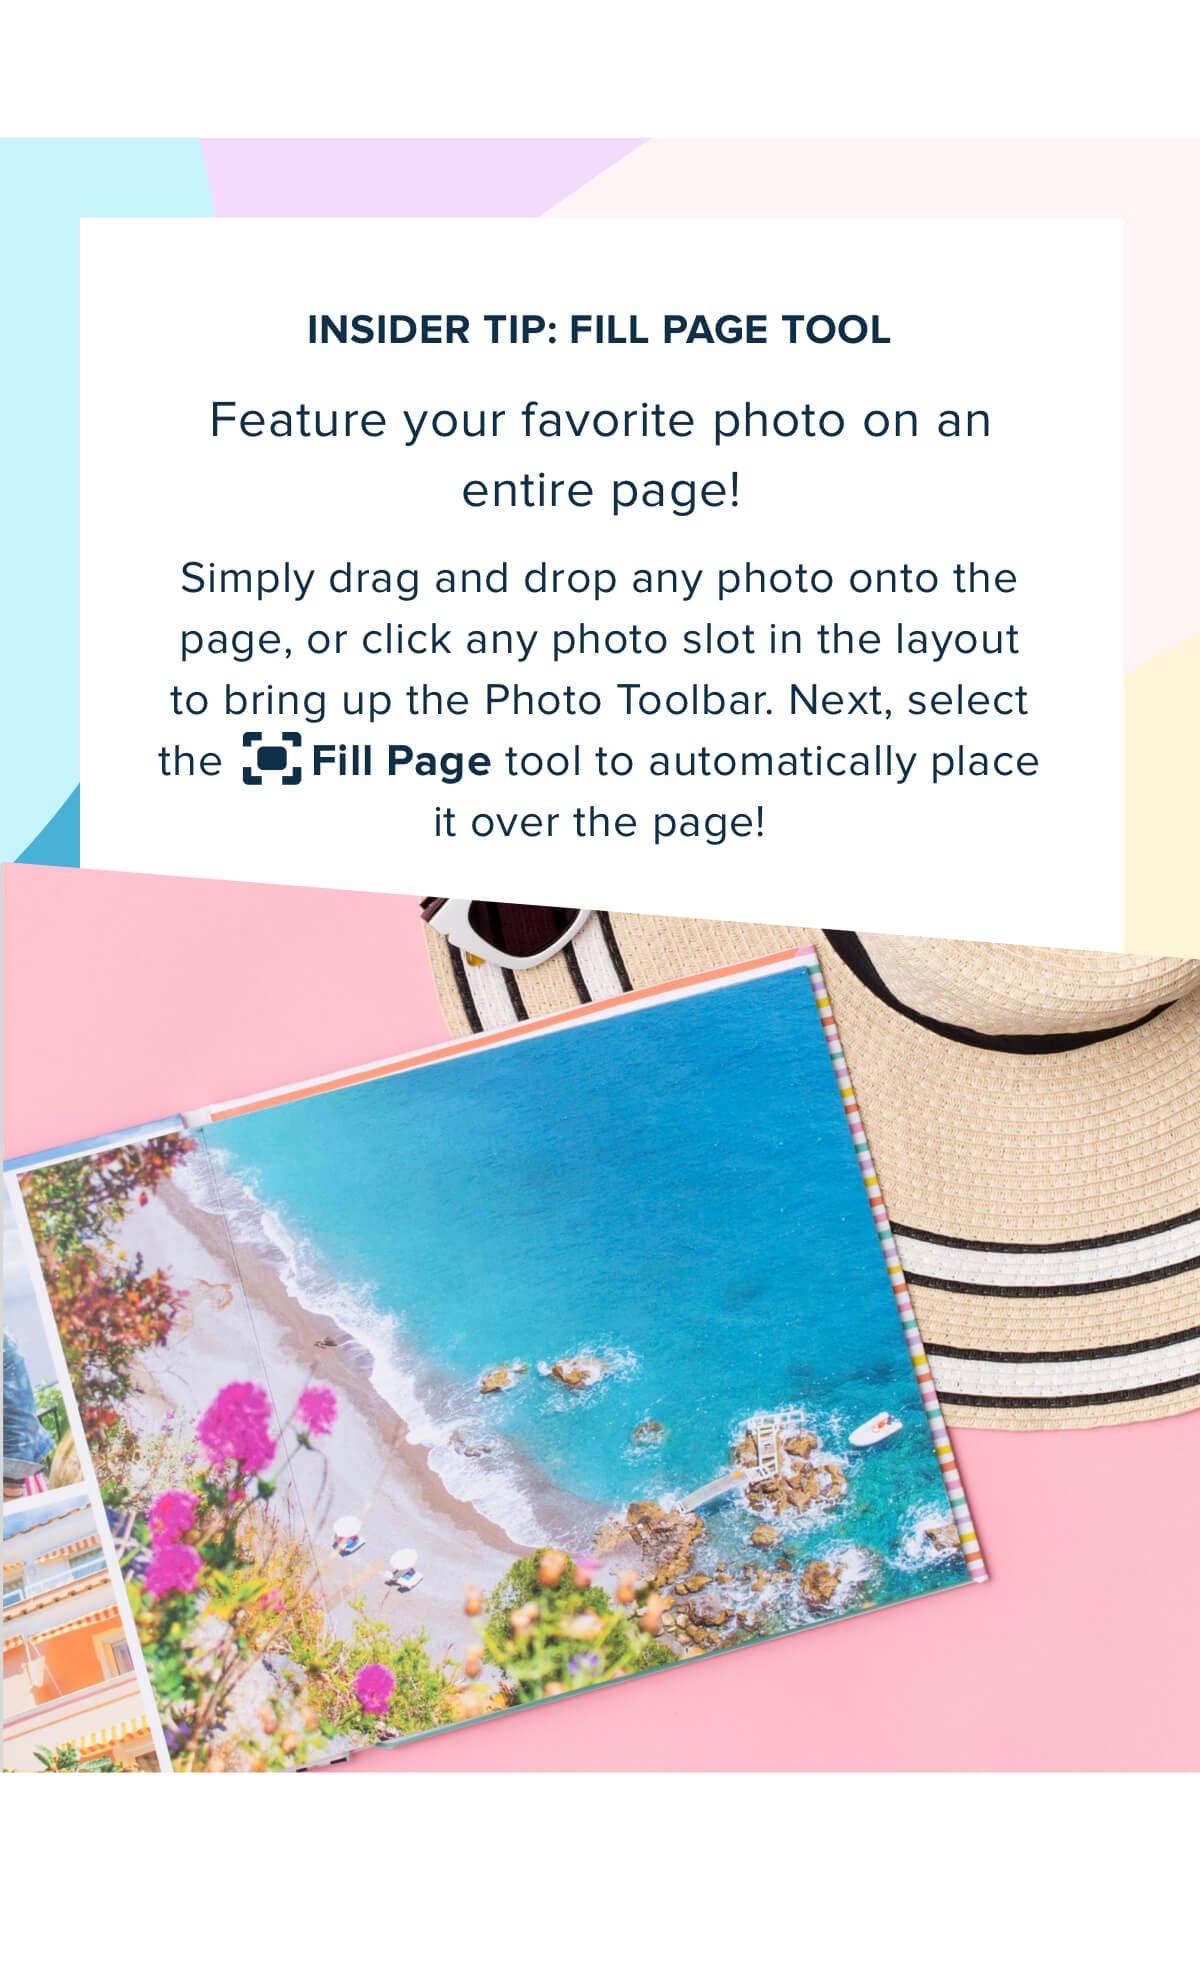 Insider Tip: Fill Page Tool